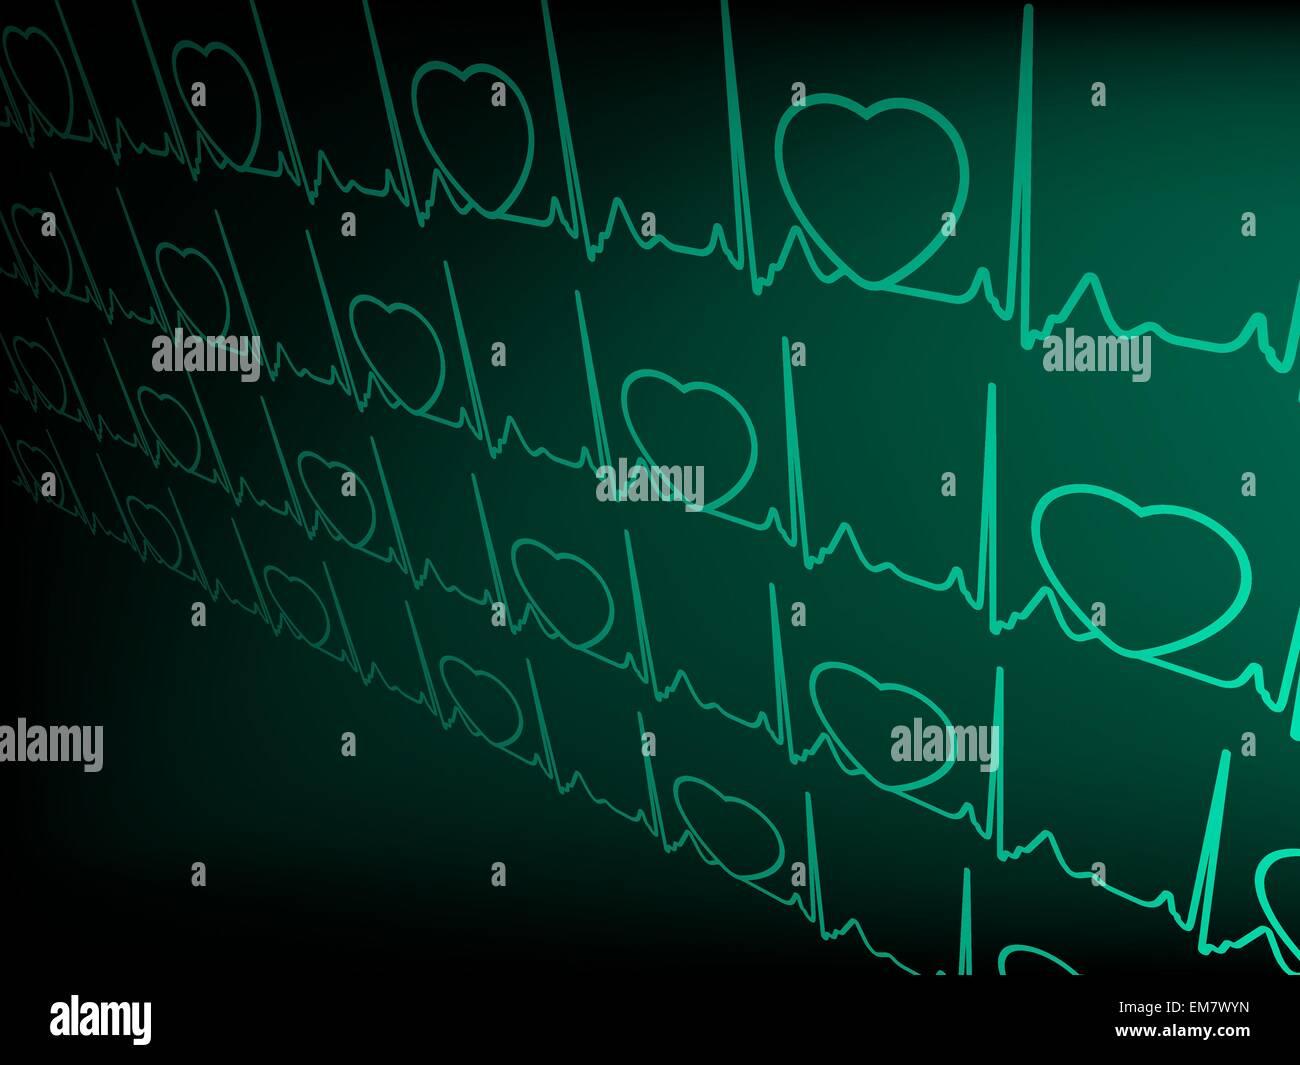 ECG tracing monitor. EPS 8 - Stock Image